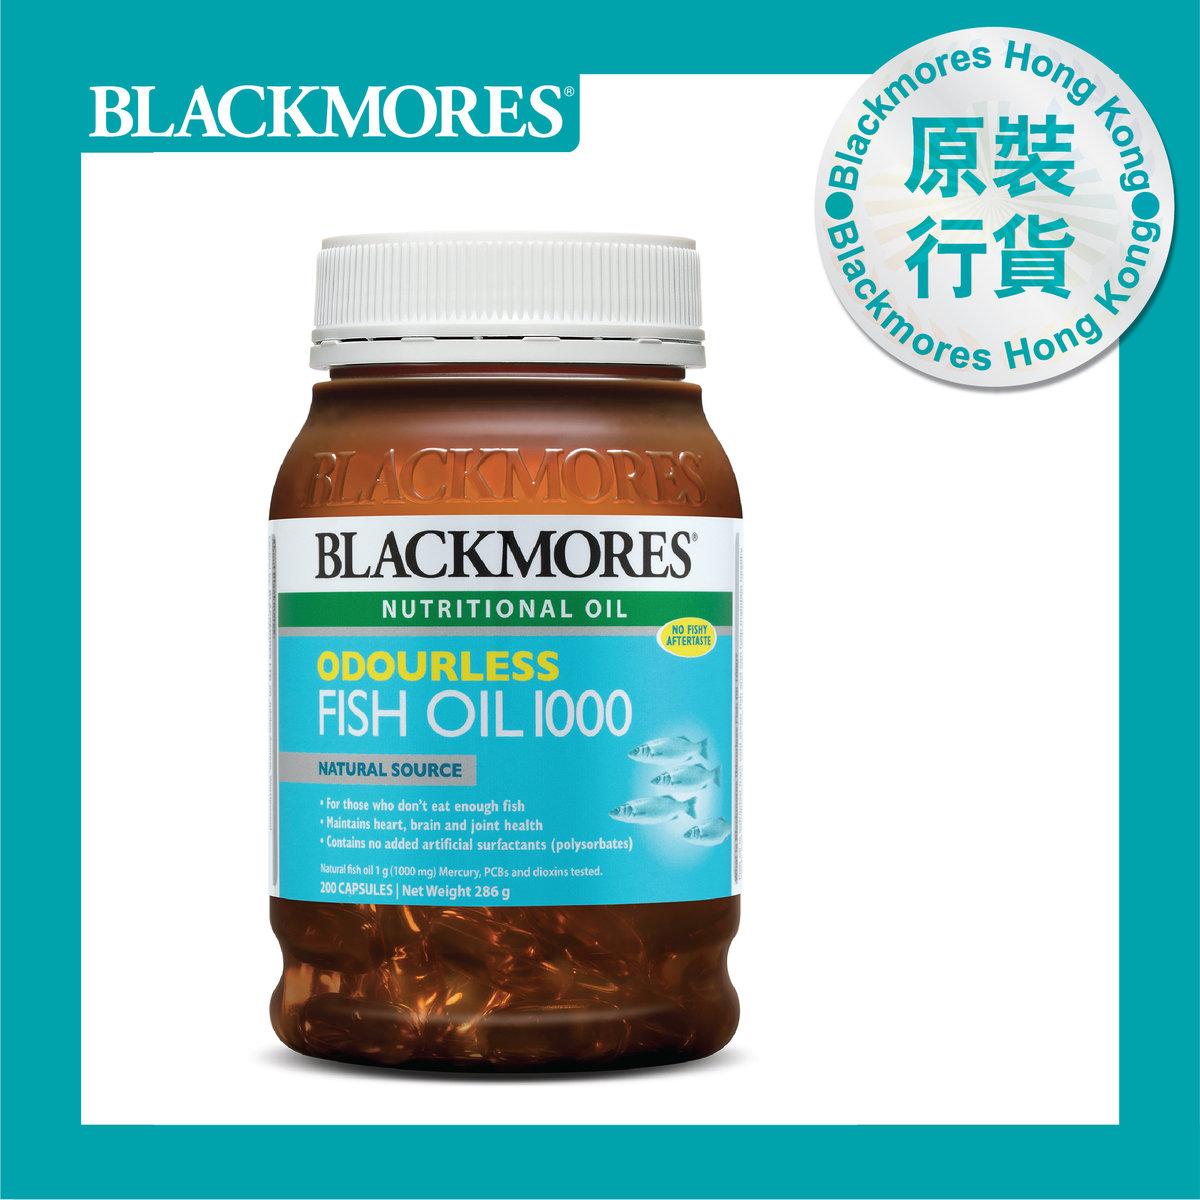 Odourless Fish Oil 1000 200 Capsules (Expiry Date: 21-Feb-2021)